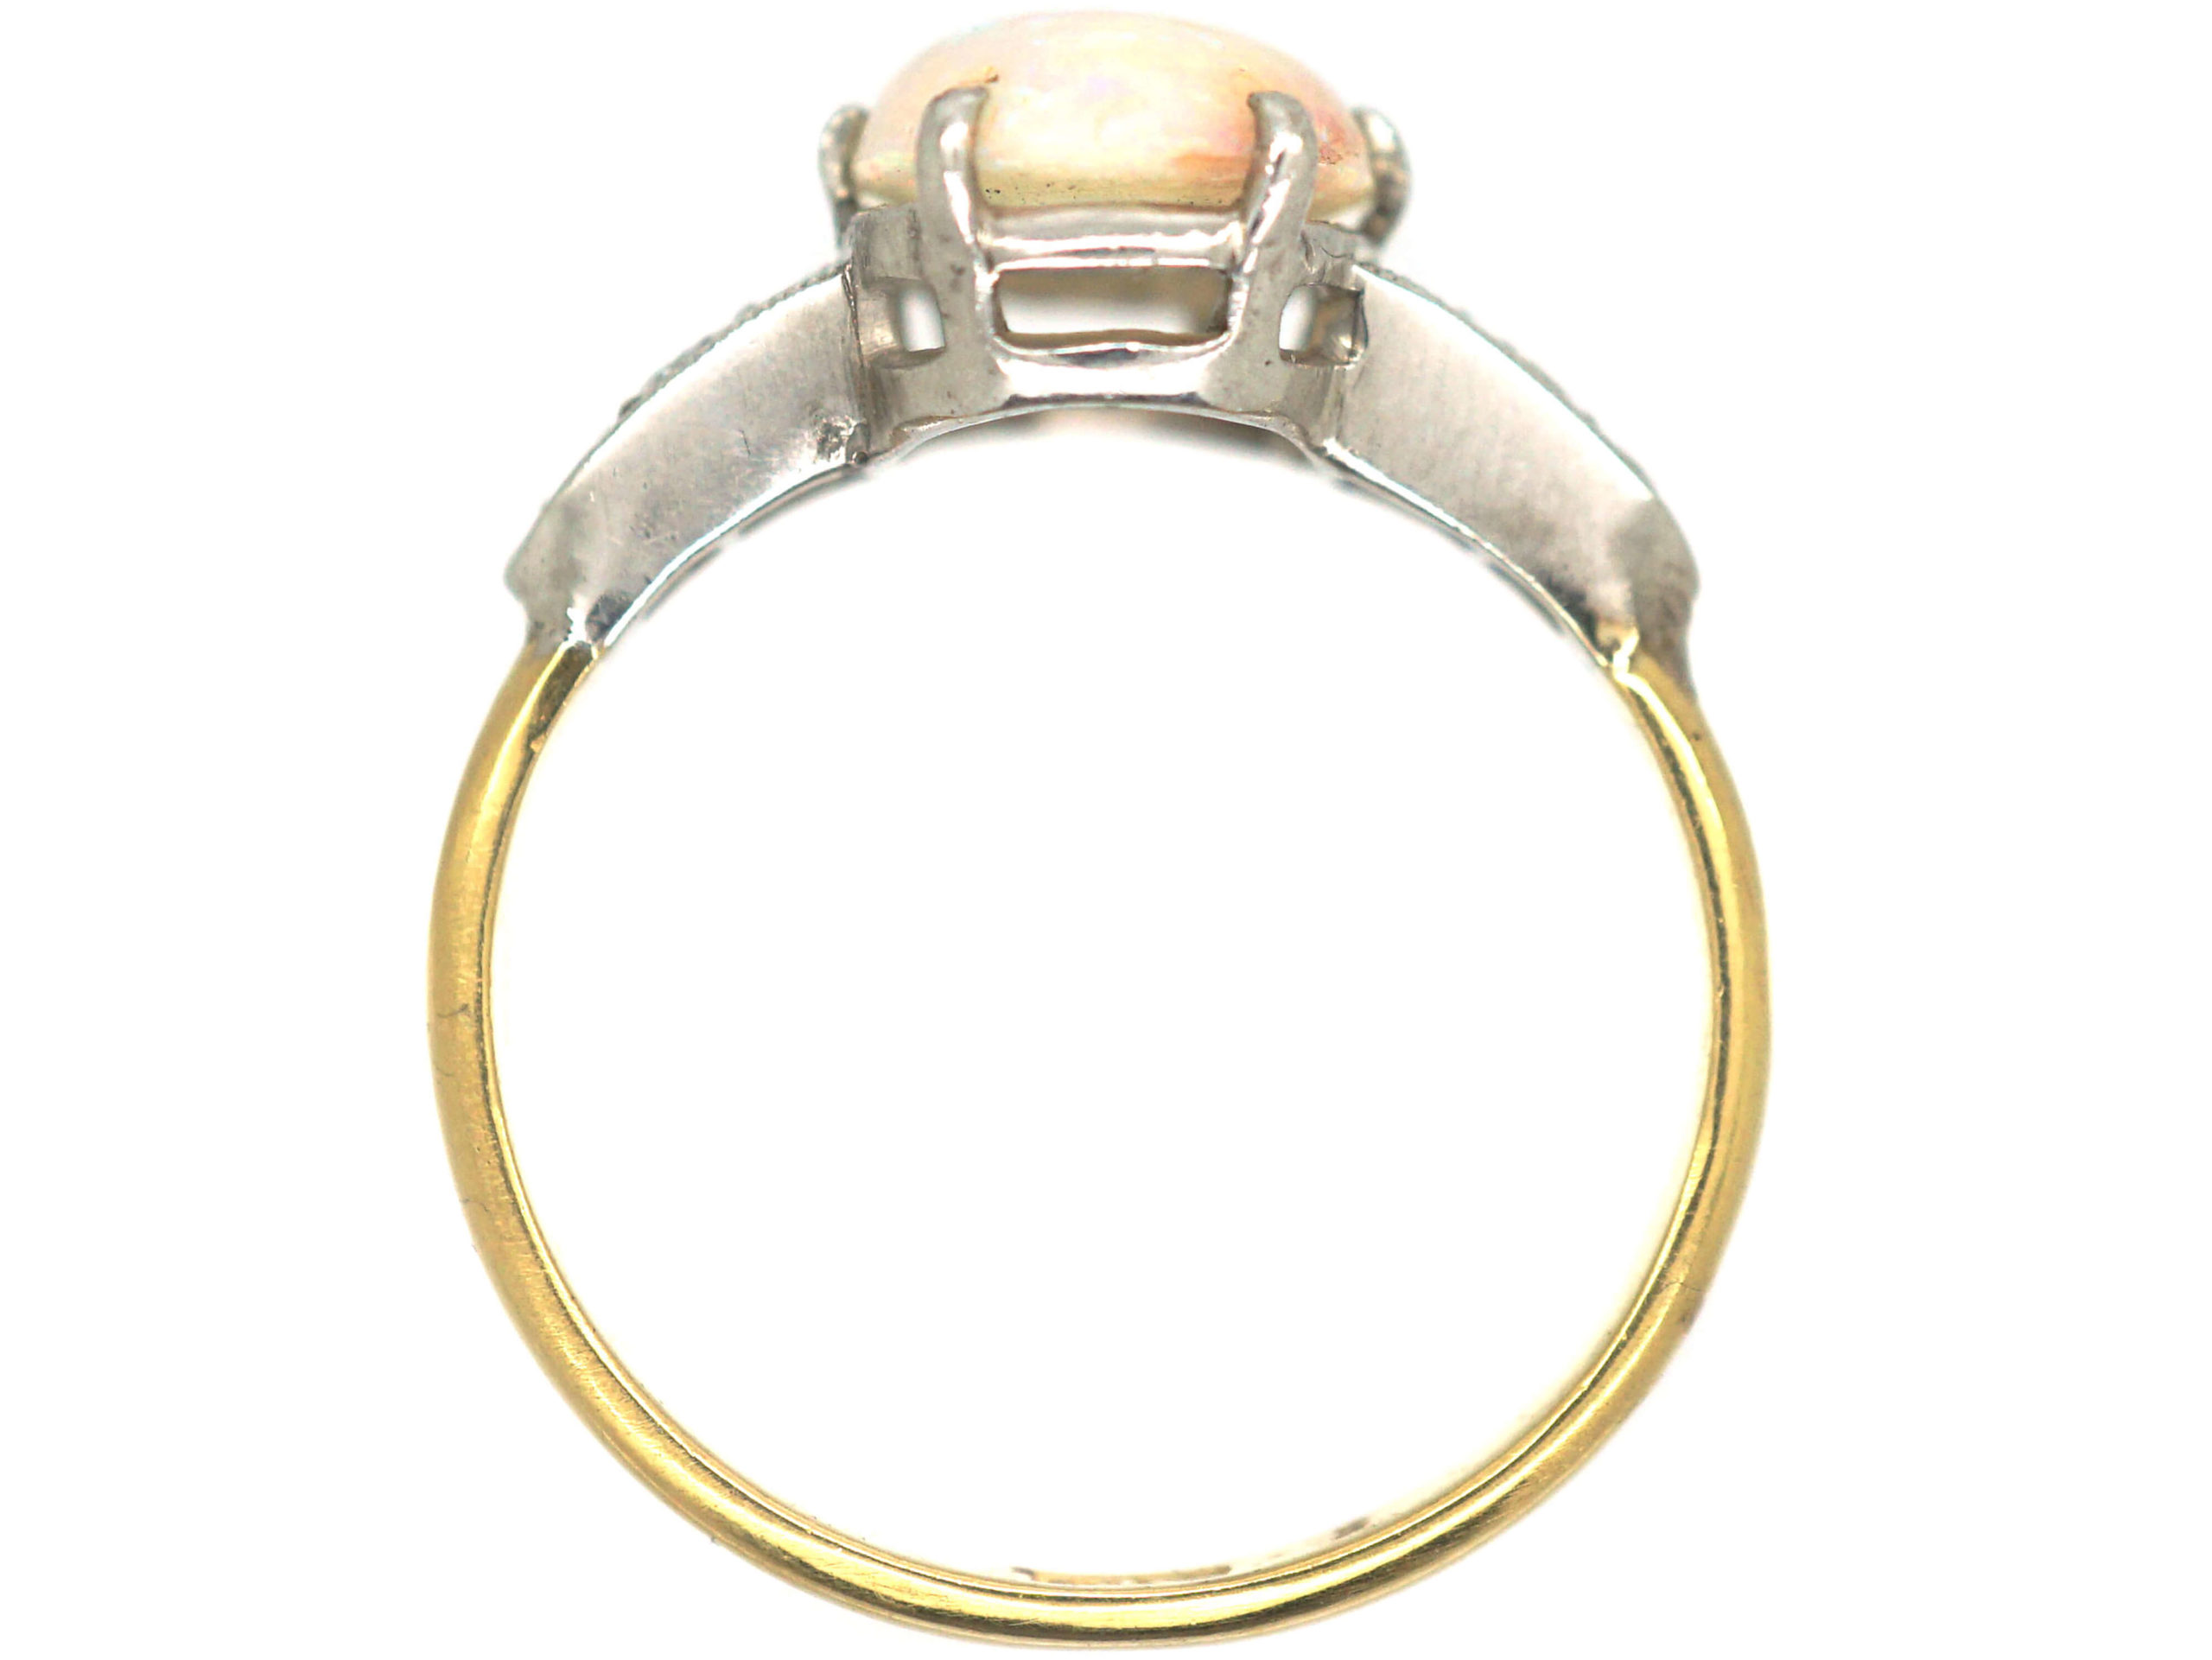 Art Deco 18ct Gold & Platinum, Opal & Diamond Ring